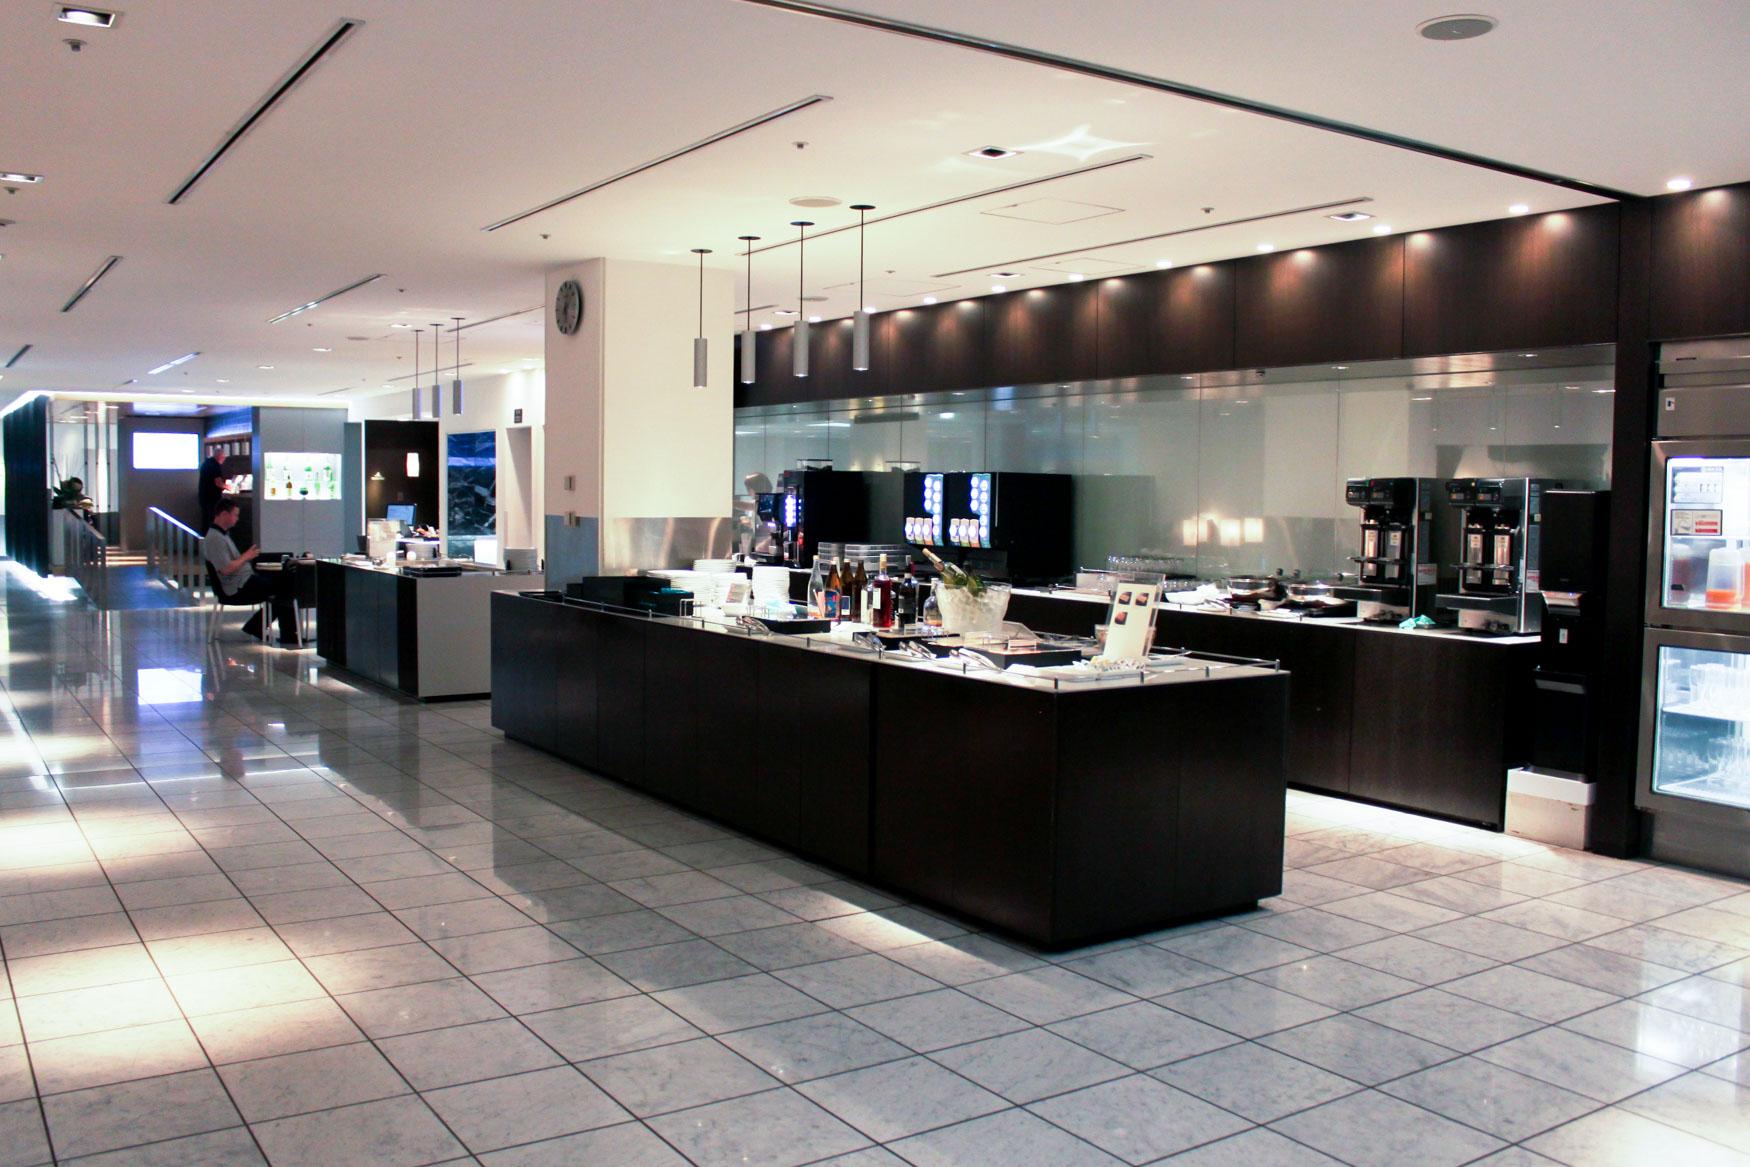 ANA Lounge Tokyo Narita Buffet Area